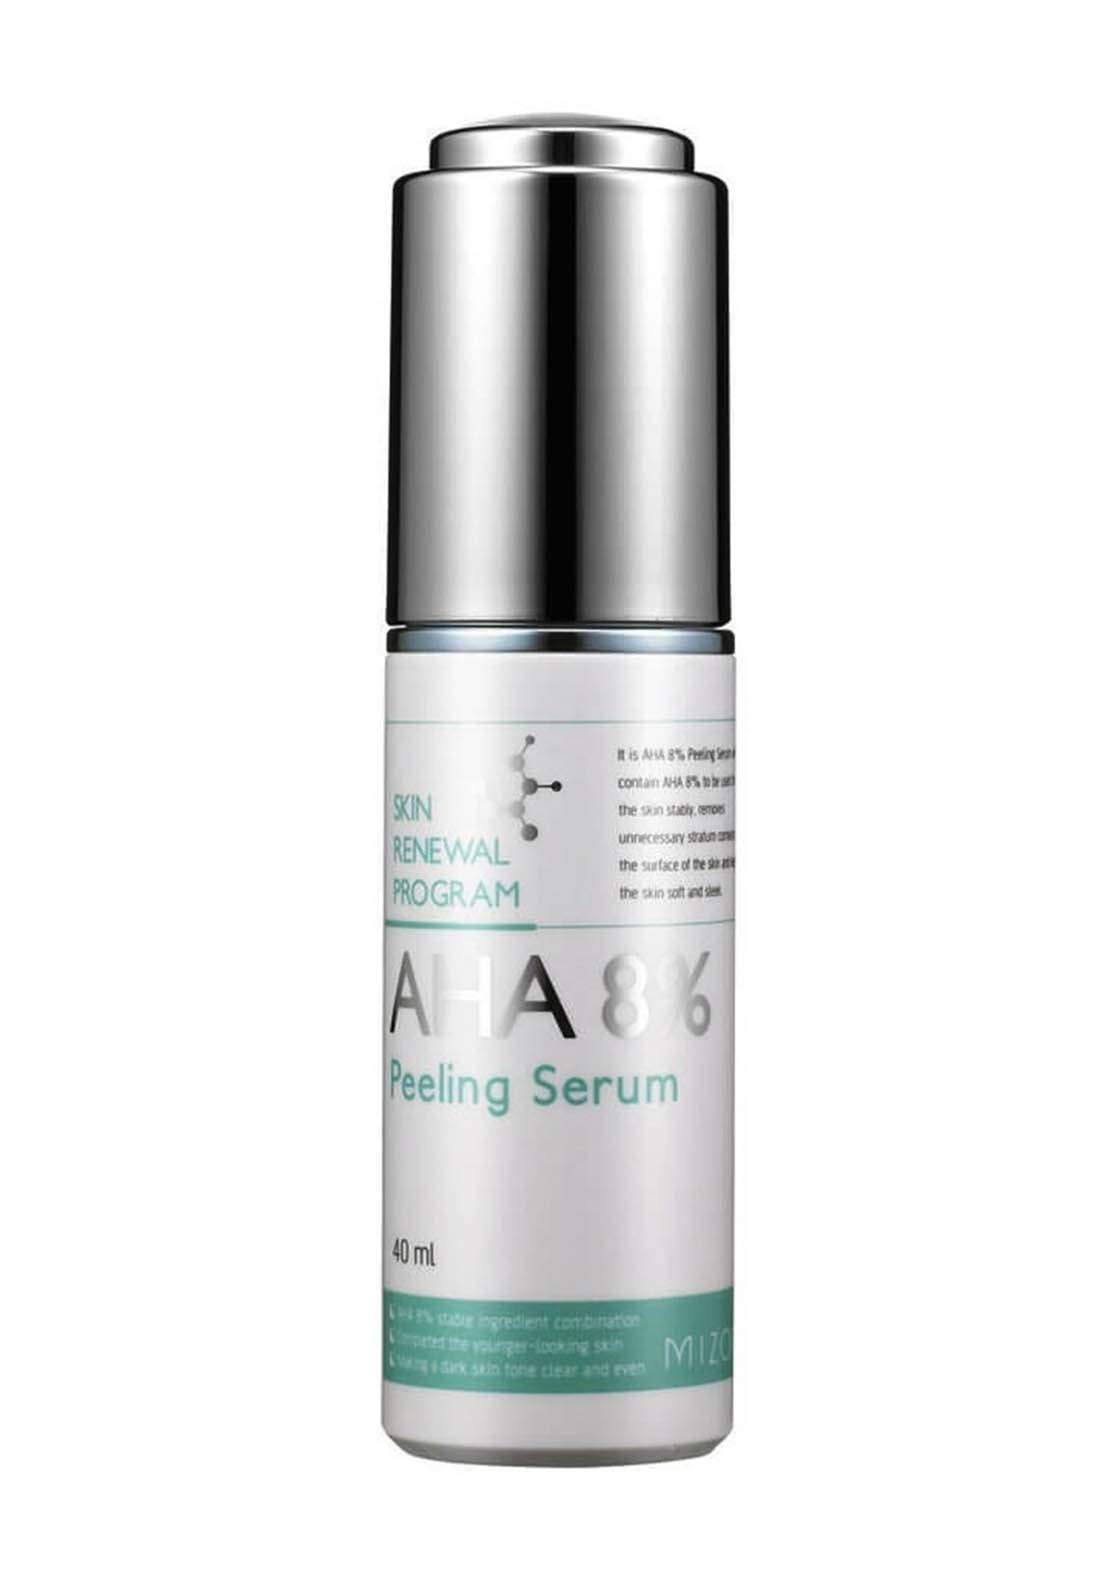 Mizon Aha 8 Peeling Serum 50ml  سيروم التقشير